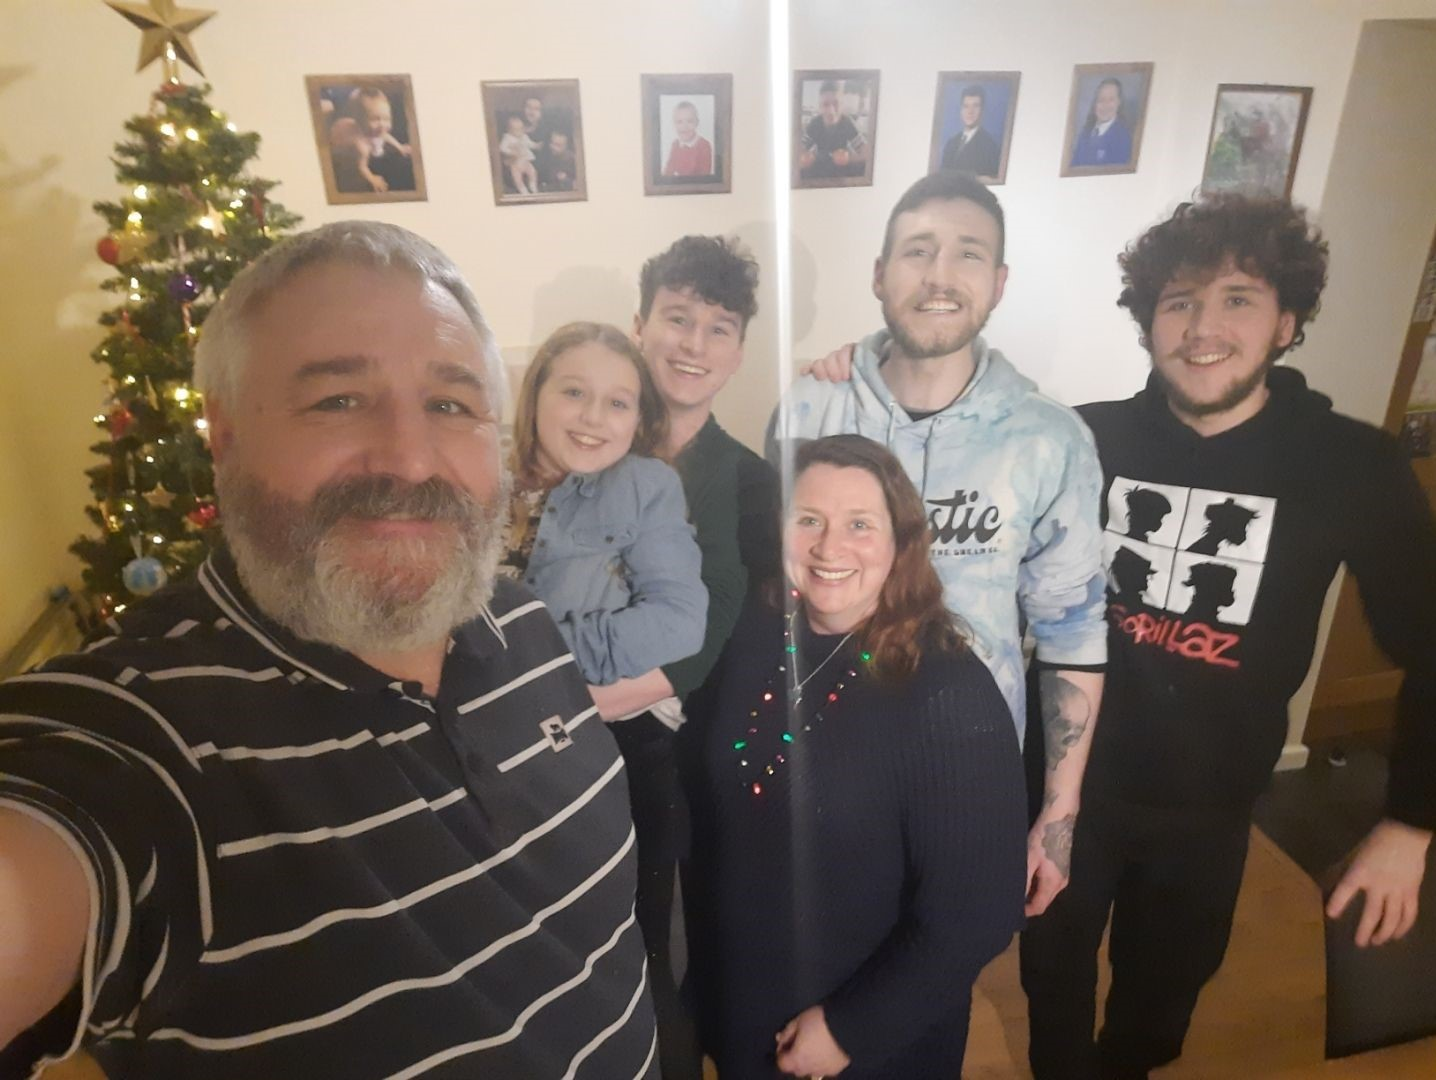 David Howard with his family around the Christmas tree